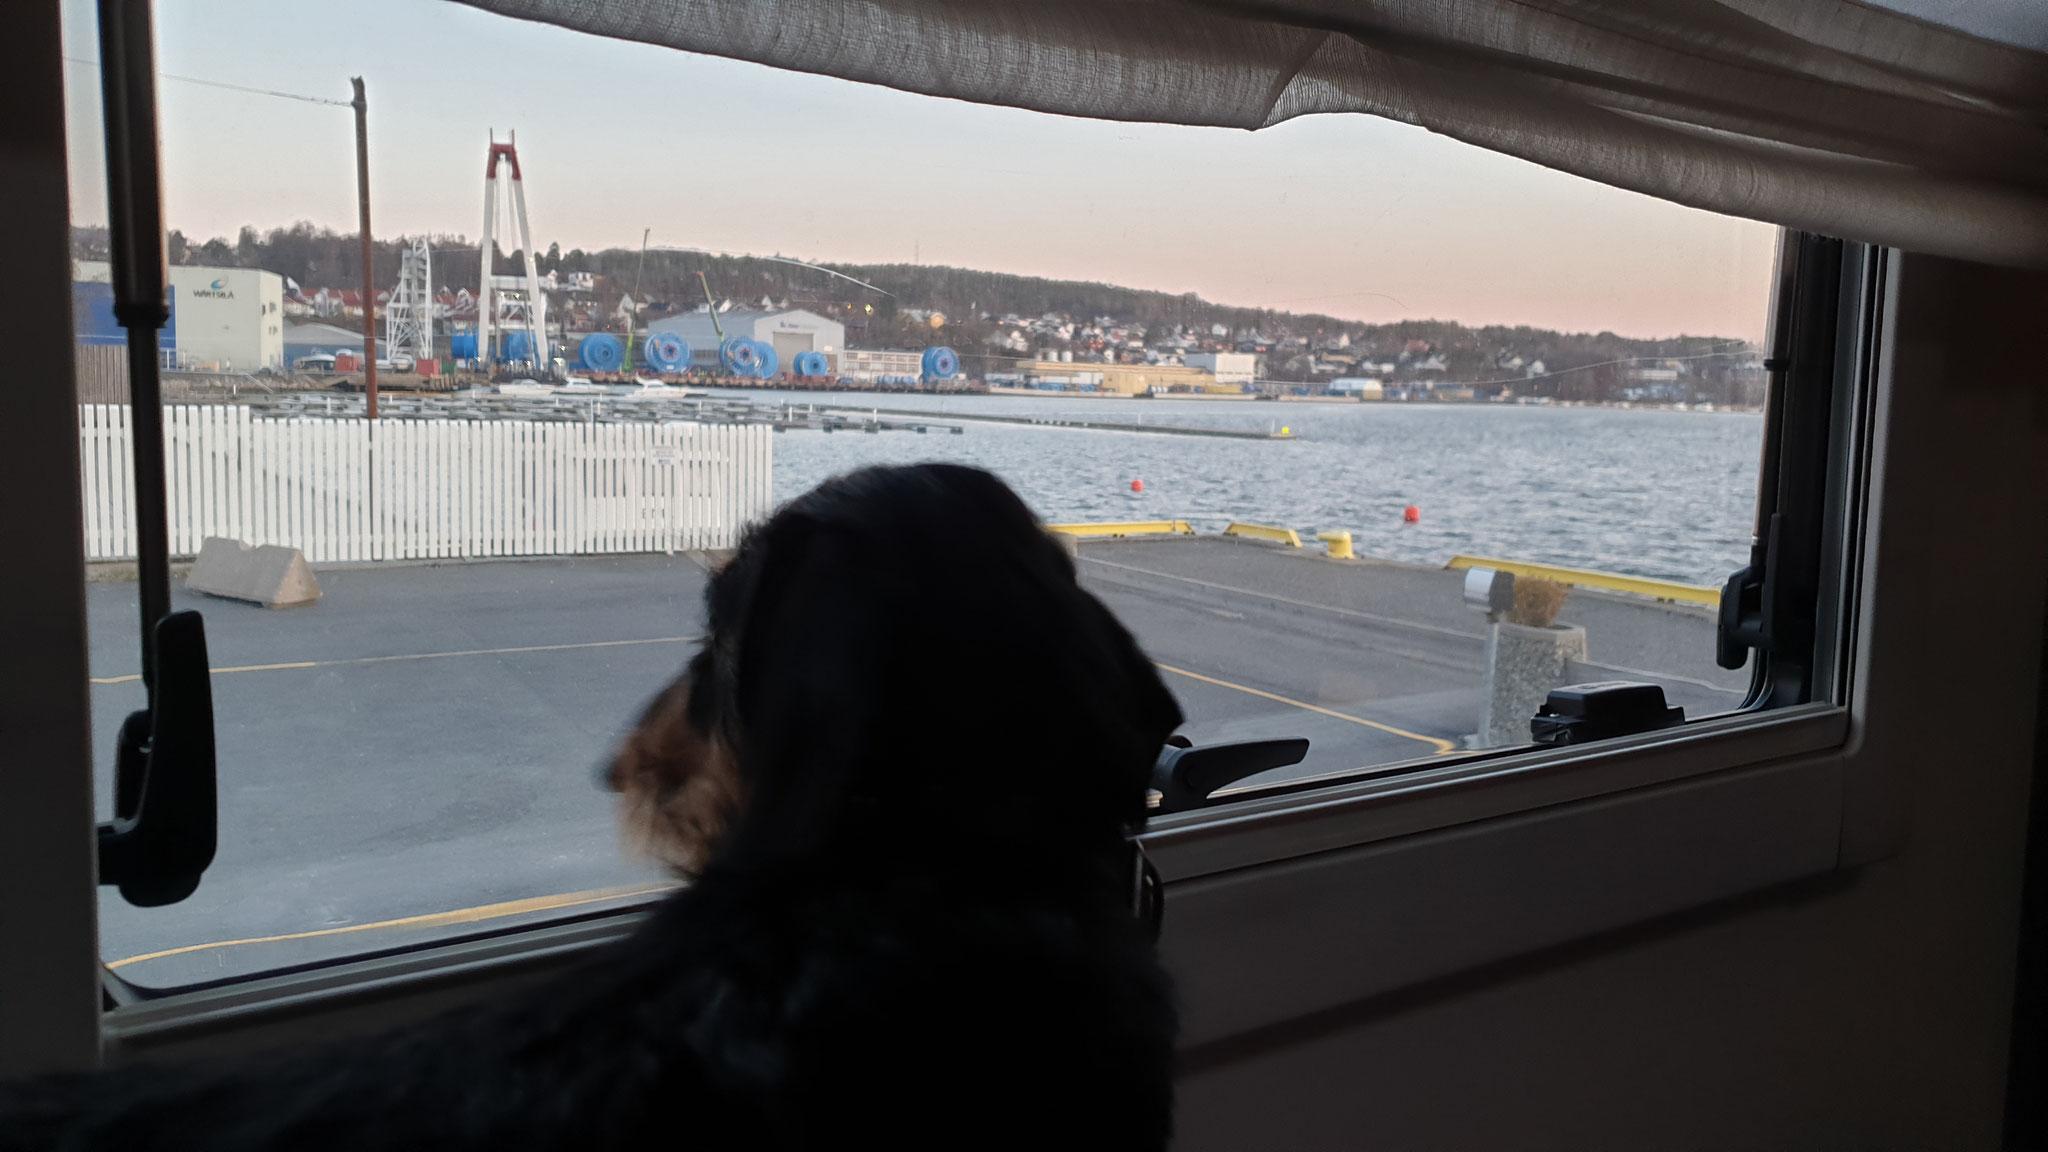 Olly hält Ausschau nach den Fischern